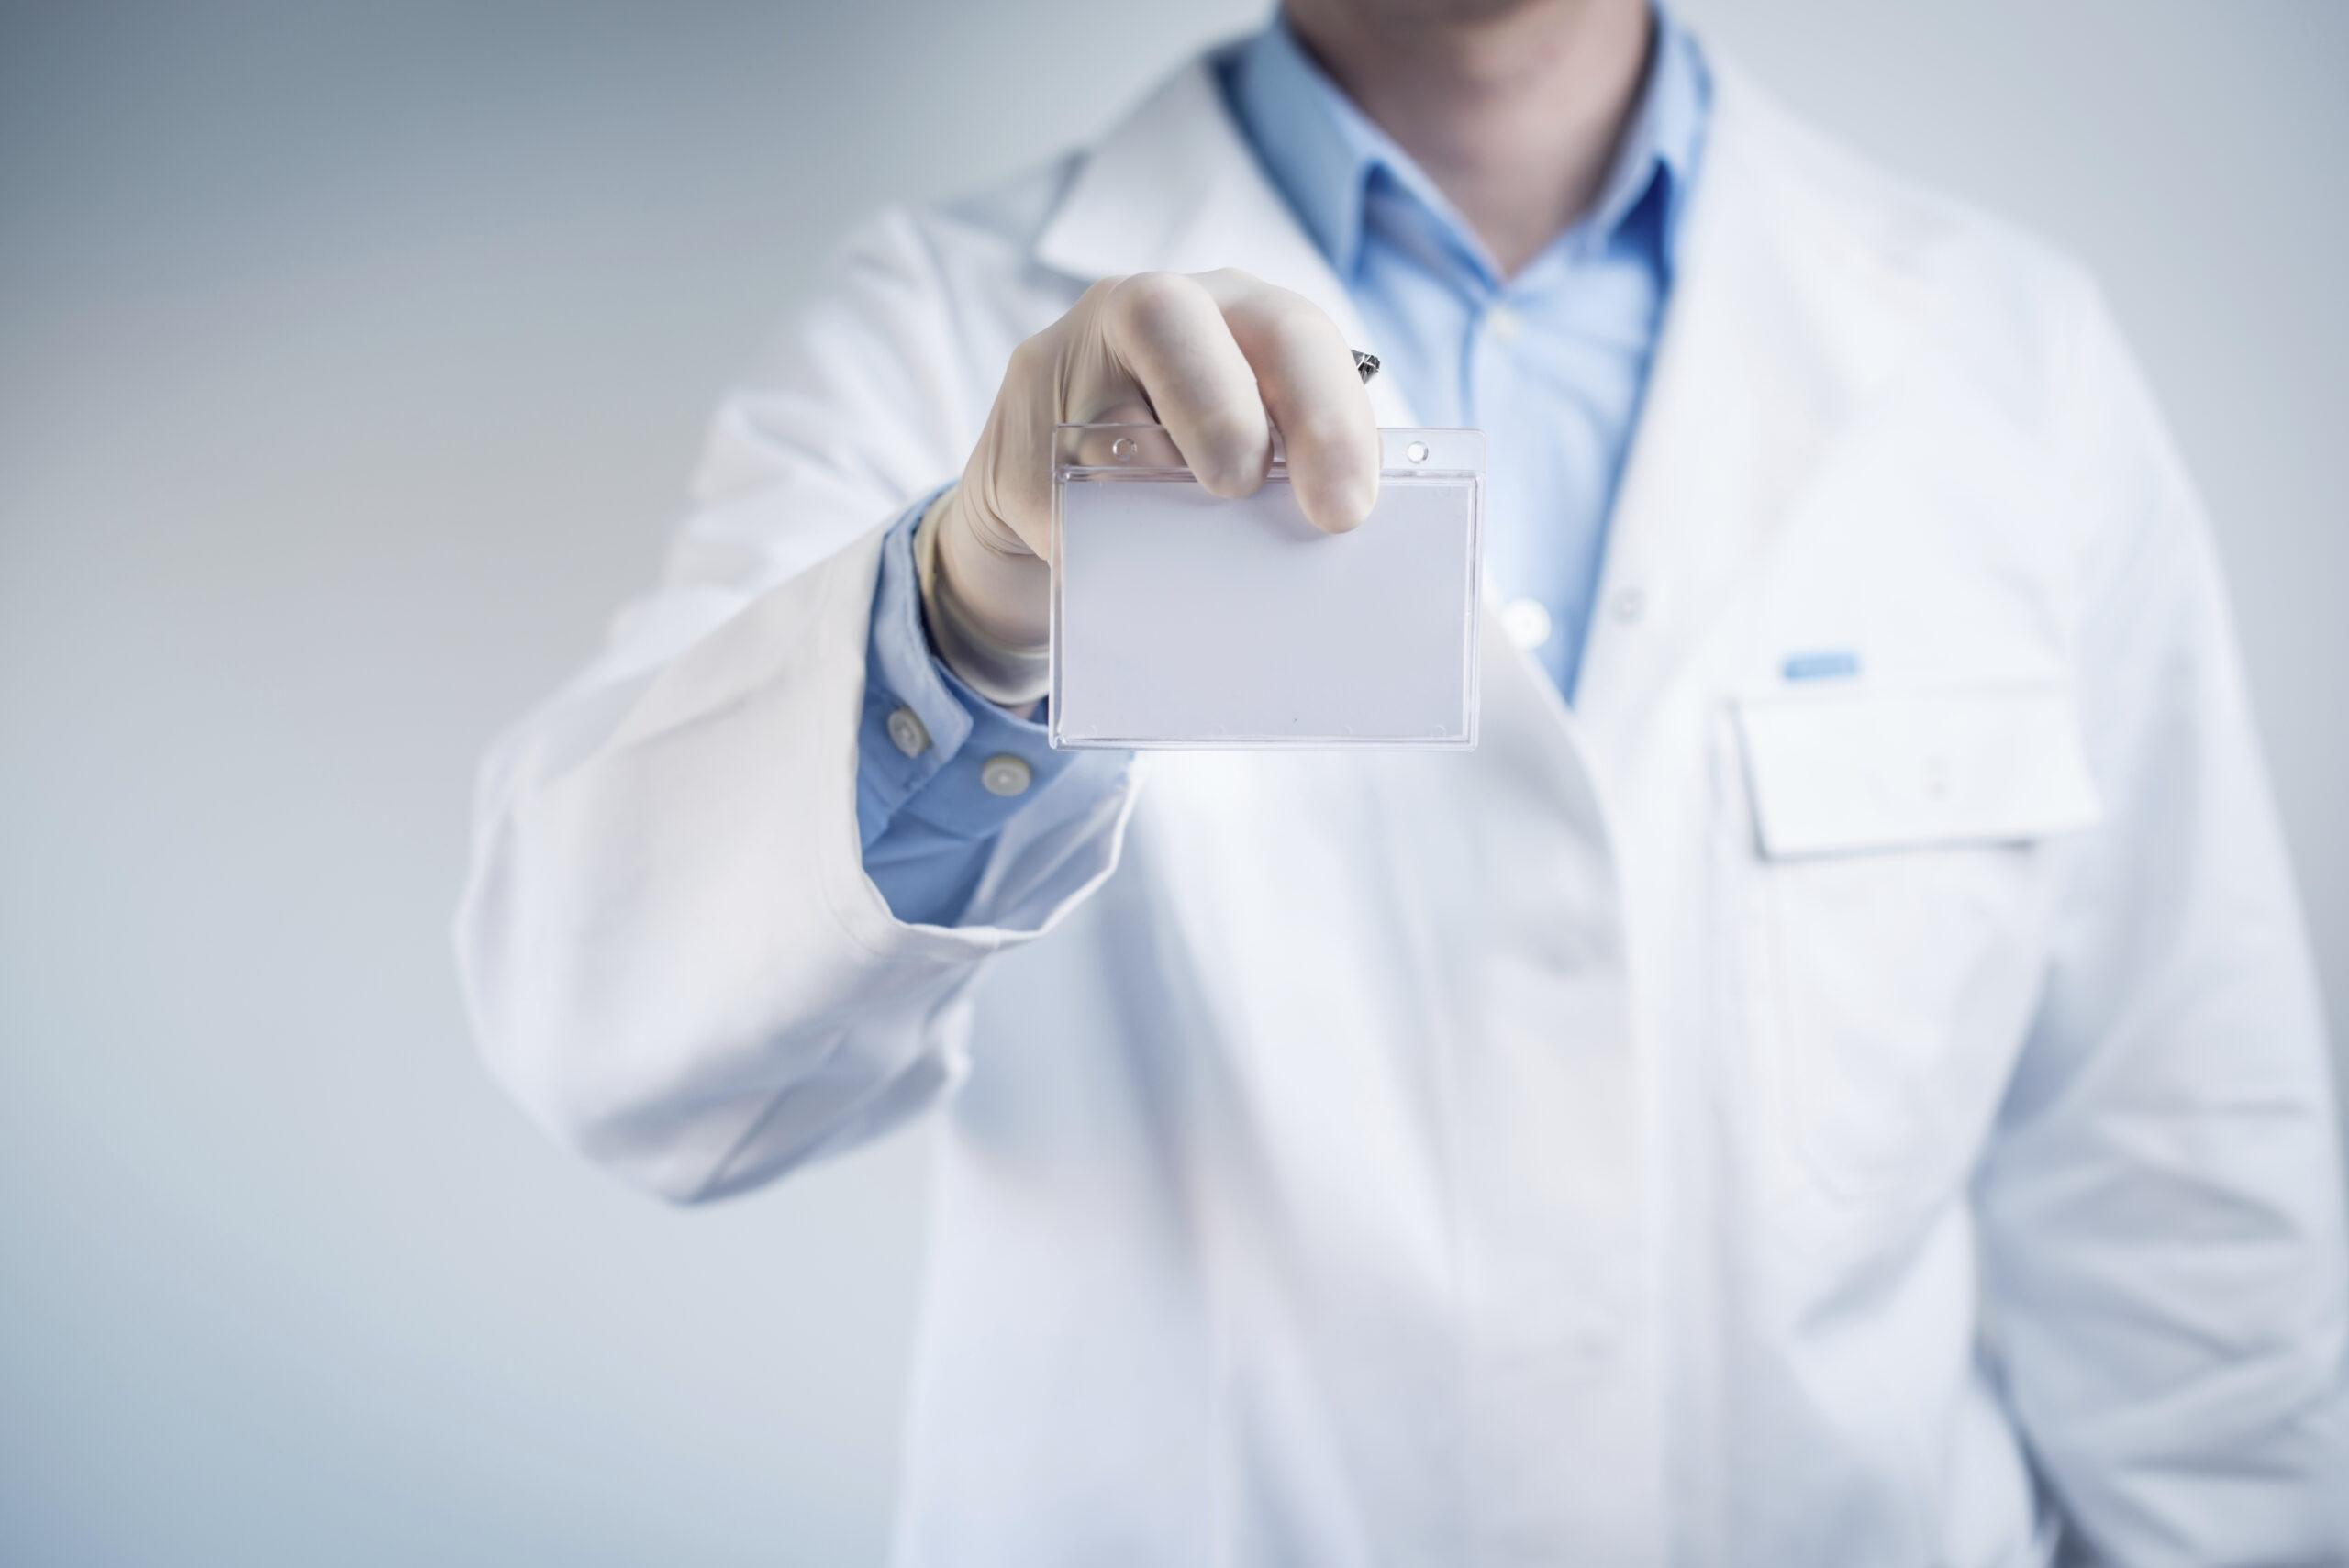 Błąd lekarski konsekwencje prawne